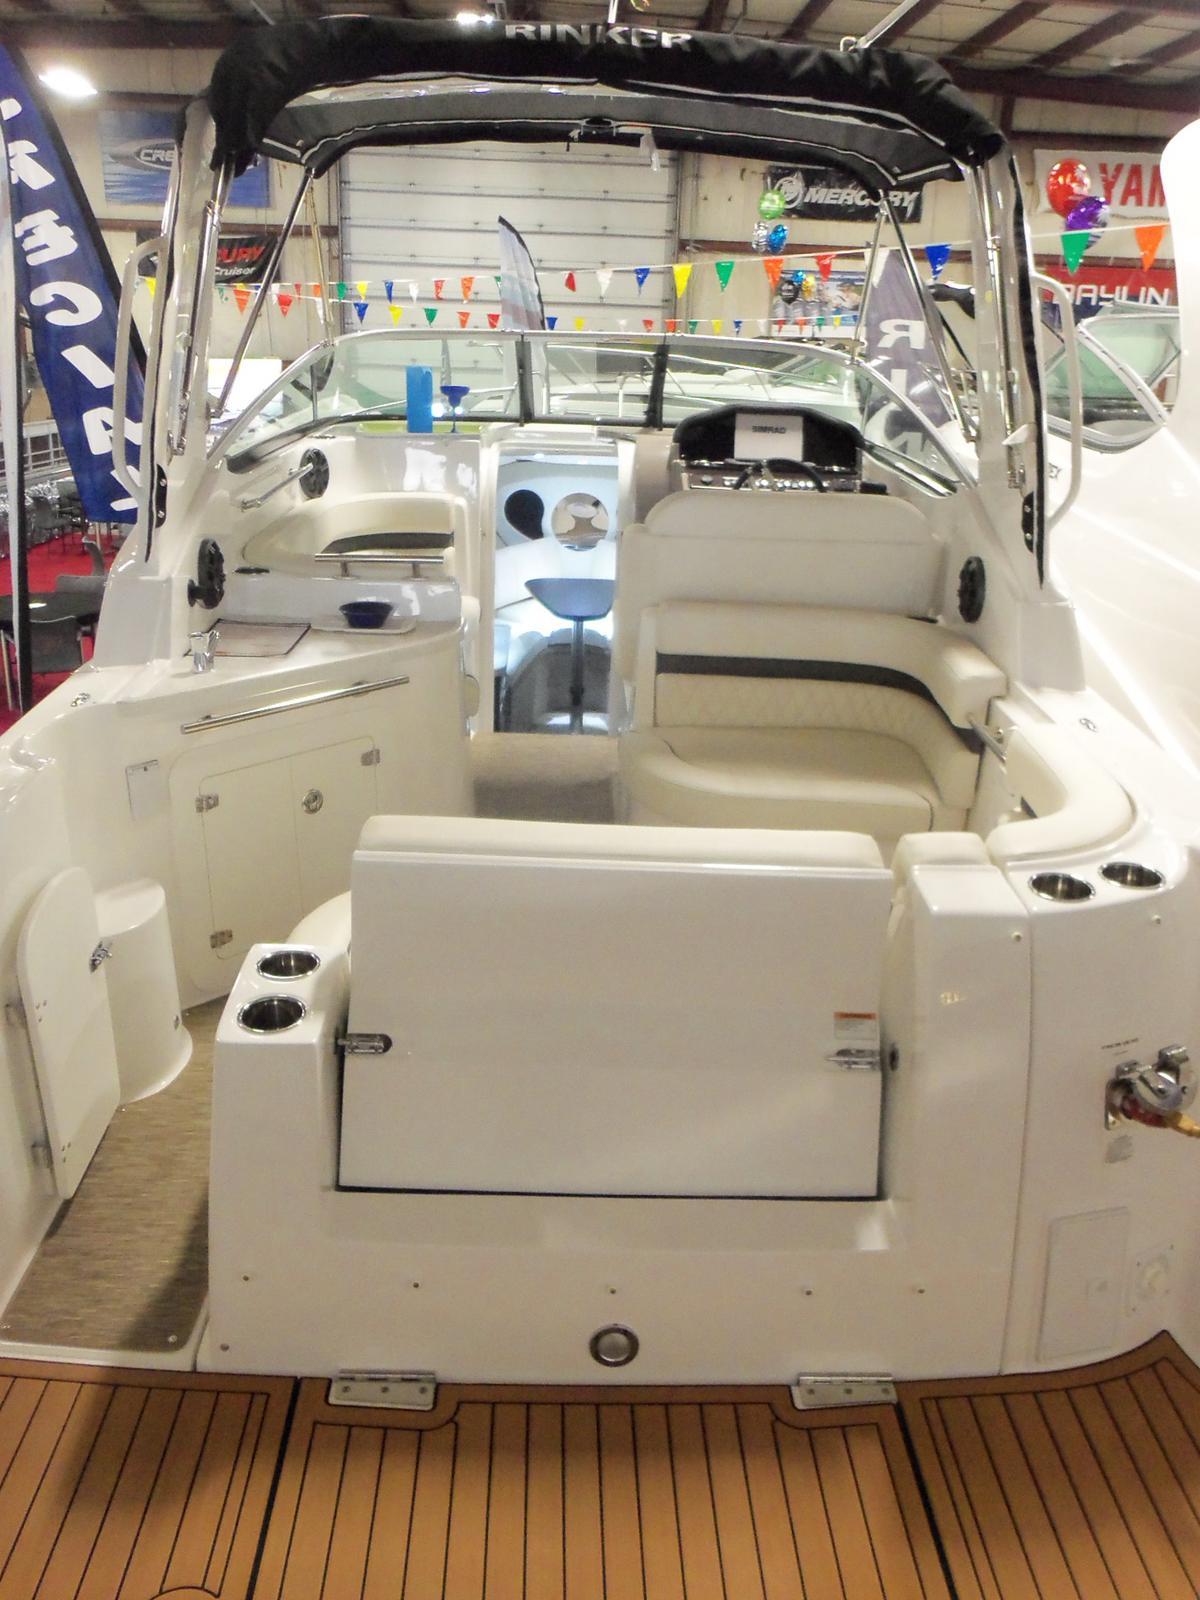 Rinker 270 EX / Express Cruiser